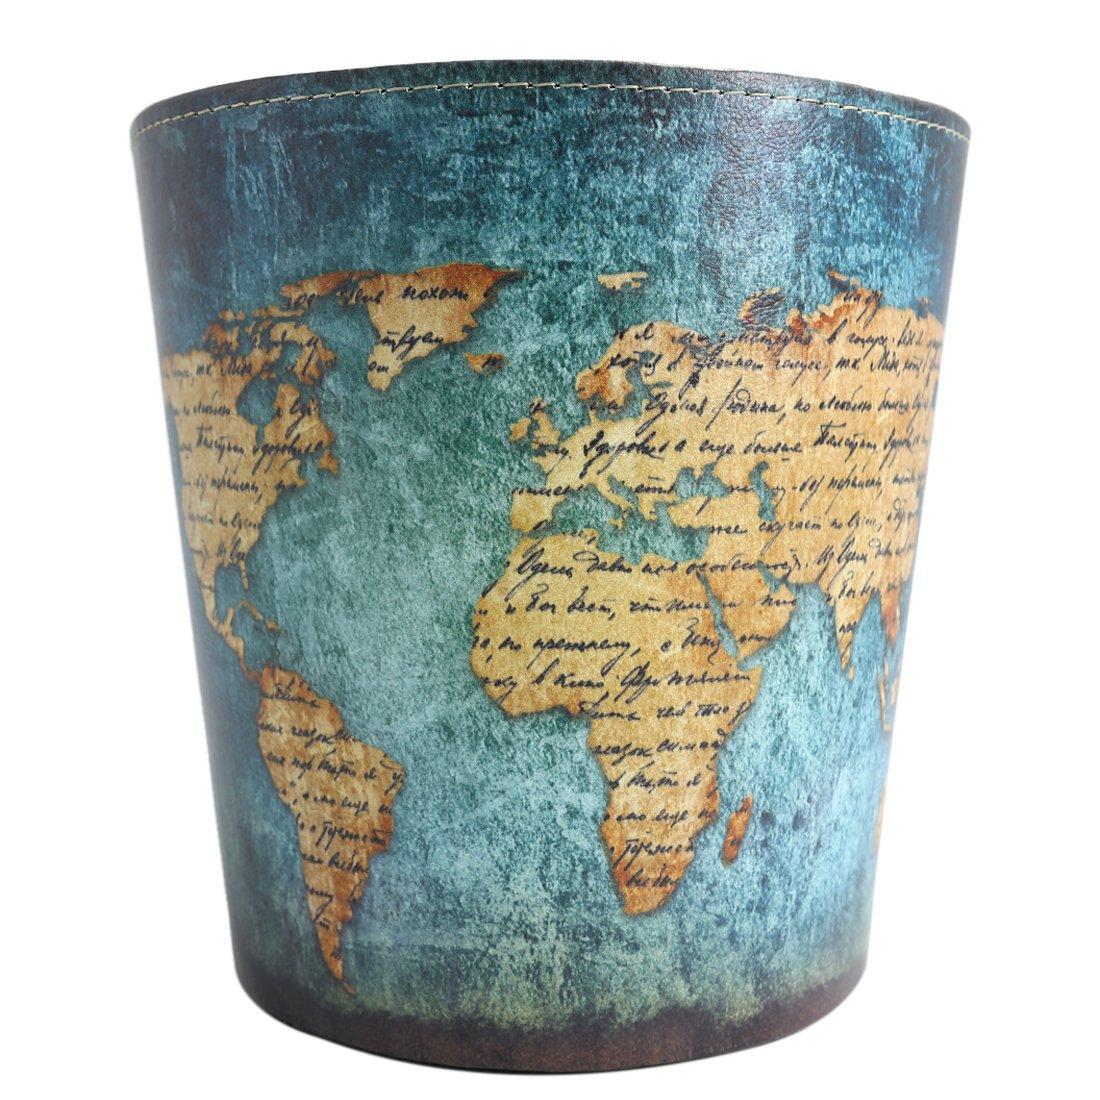 Wastebasket Trash Can for Bedroom Bathroom Kitchen Office Recycling Garbage Bin - World Map Pattern